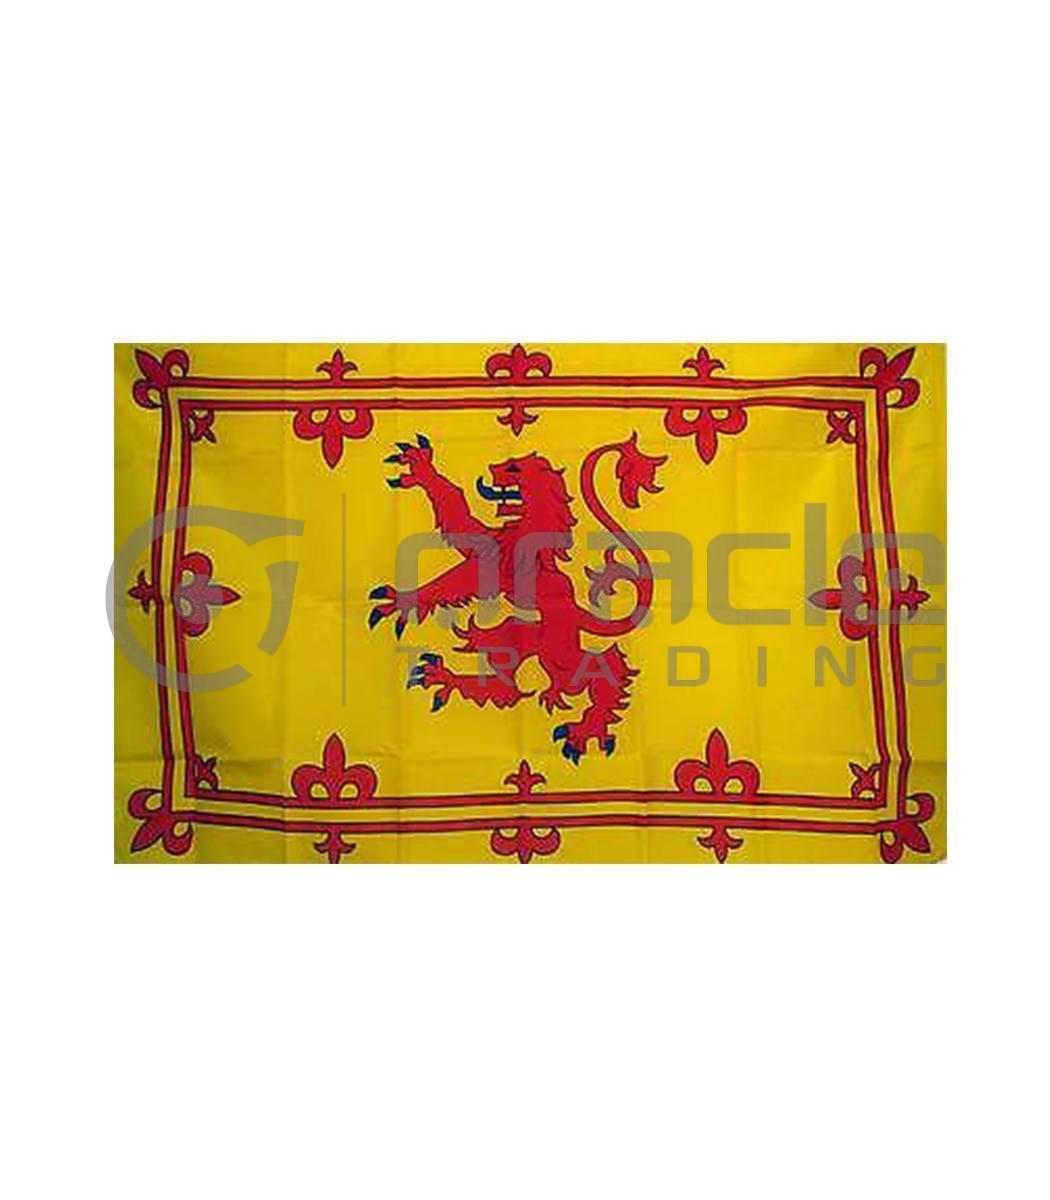 Large 3'x5' Scotland Flag - Rampant Lion